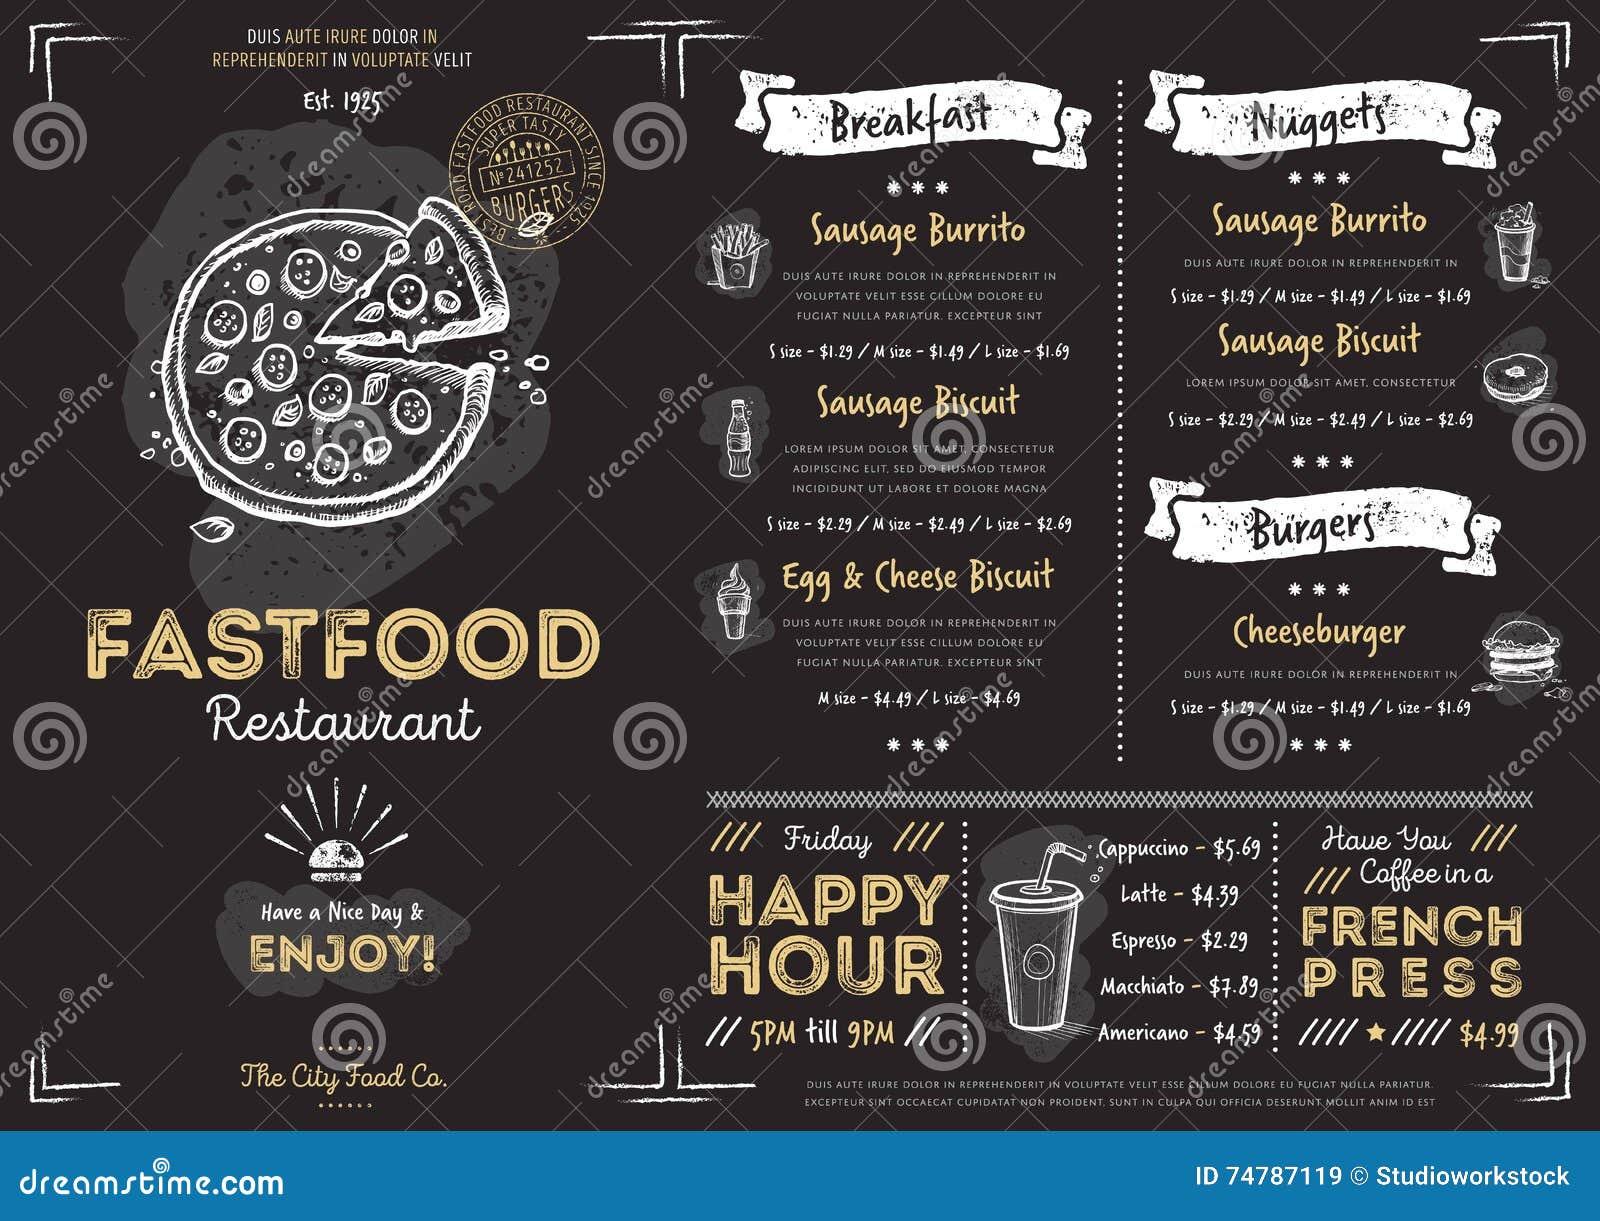 Restaurant Cafe Fast Food Menu Template Stock Vector - Illustration ...